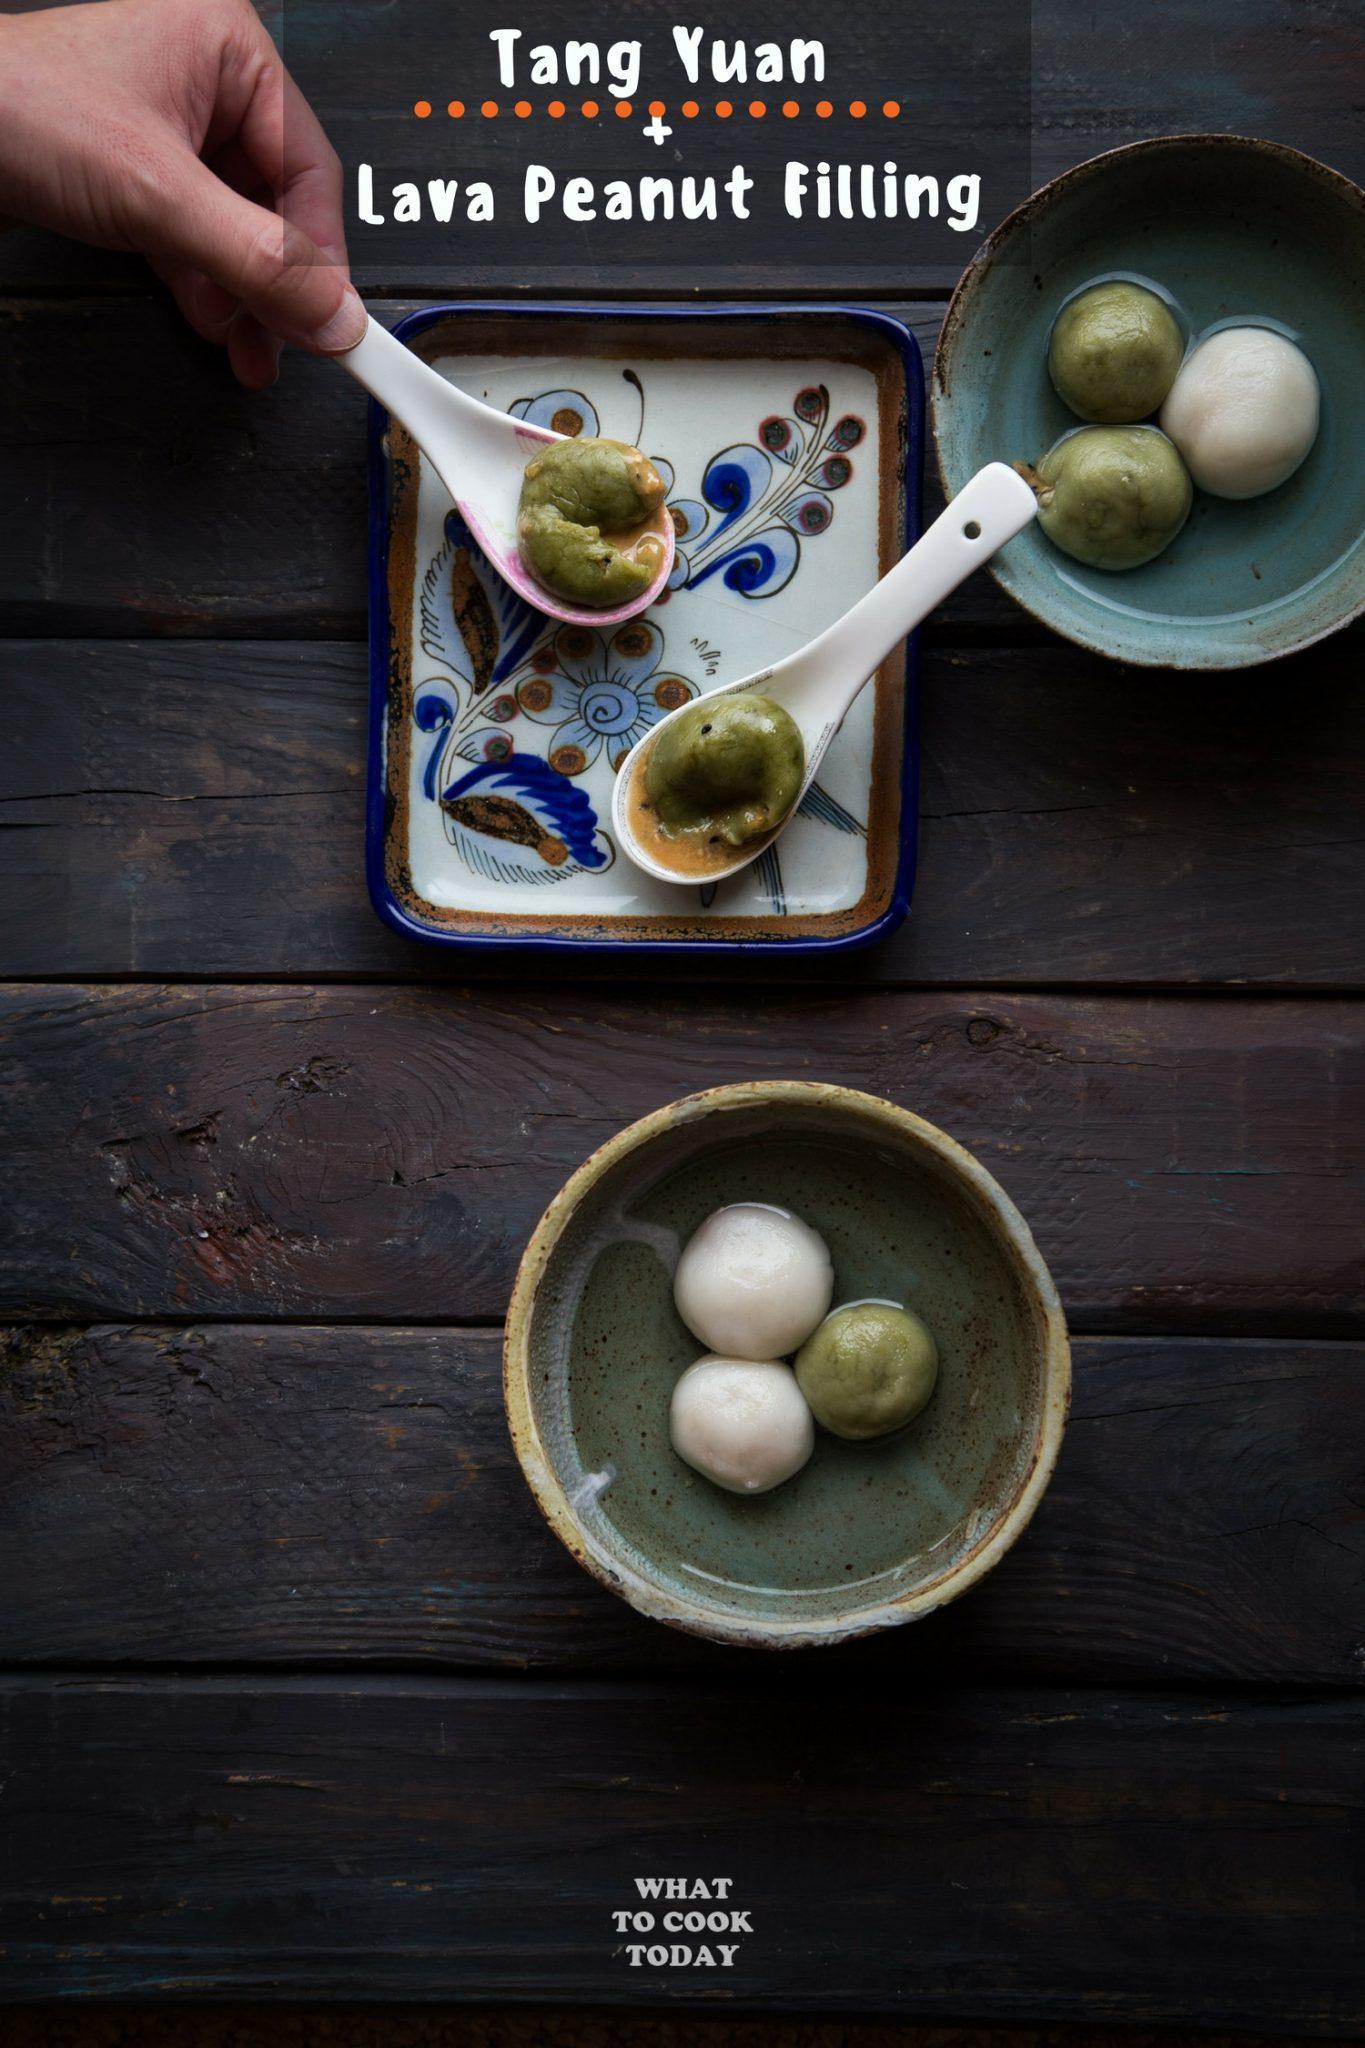 Tang Yuan with Lava Peanut Filling #tangyuan #peanut #chinesefood #dessert